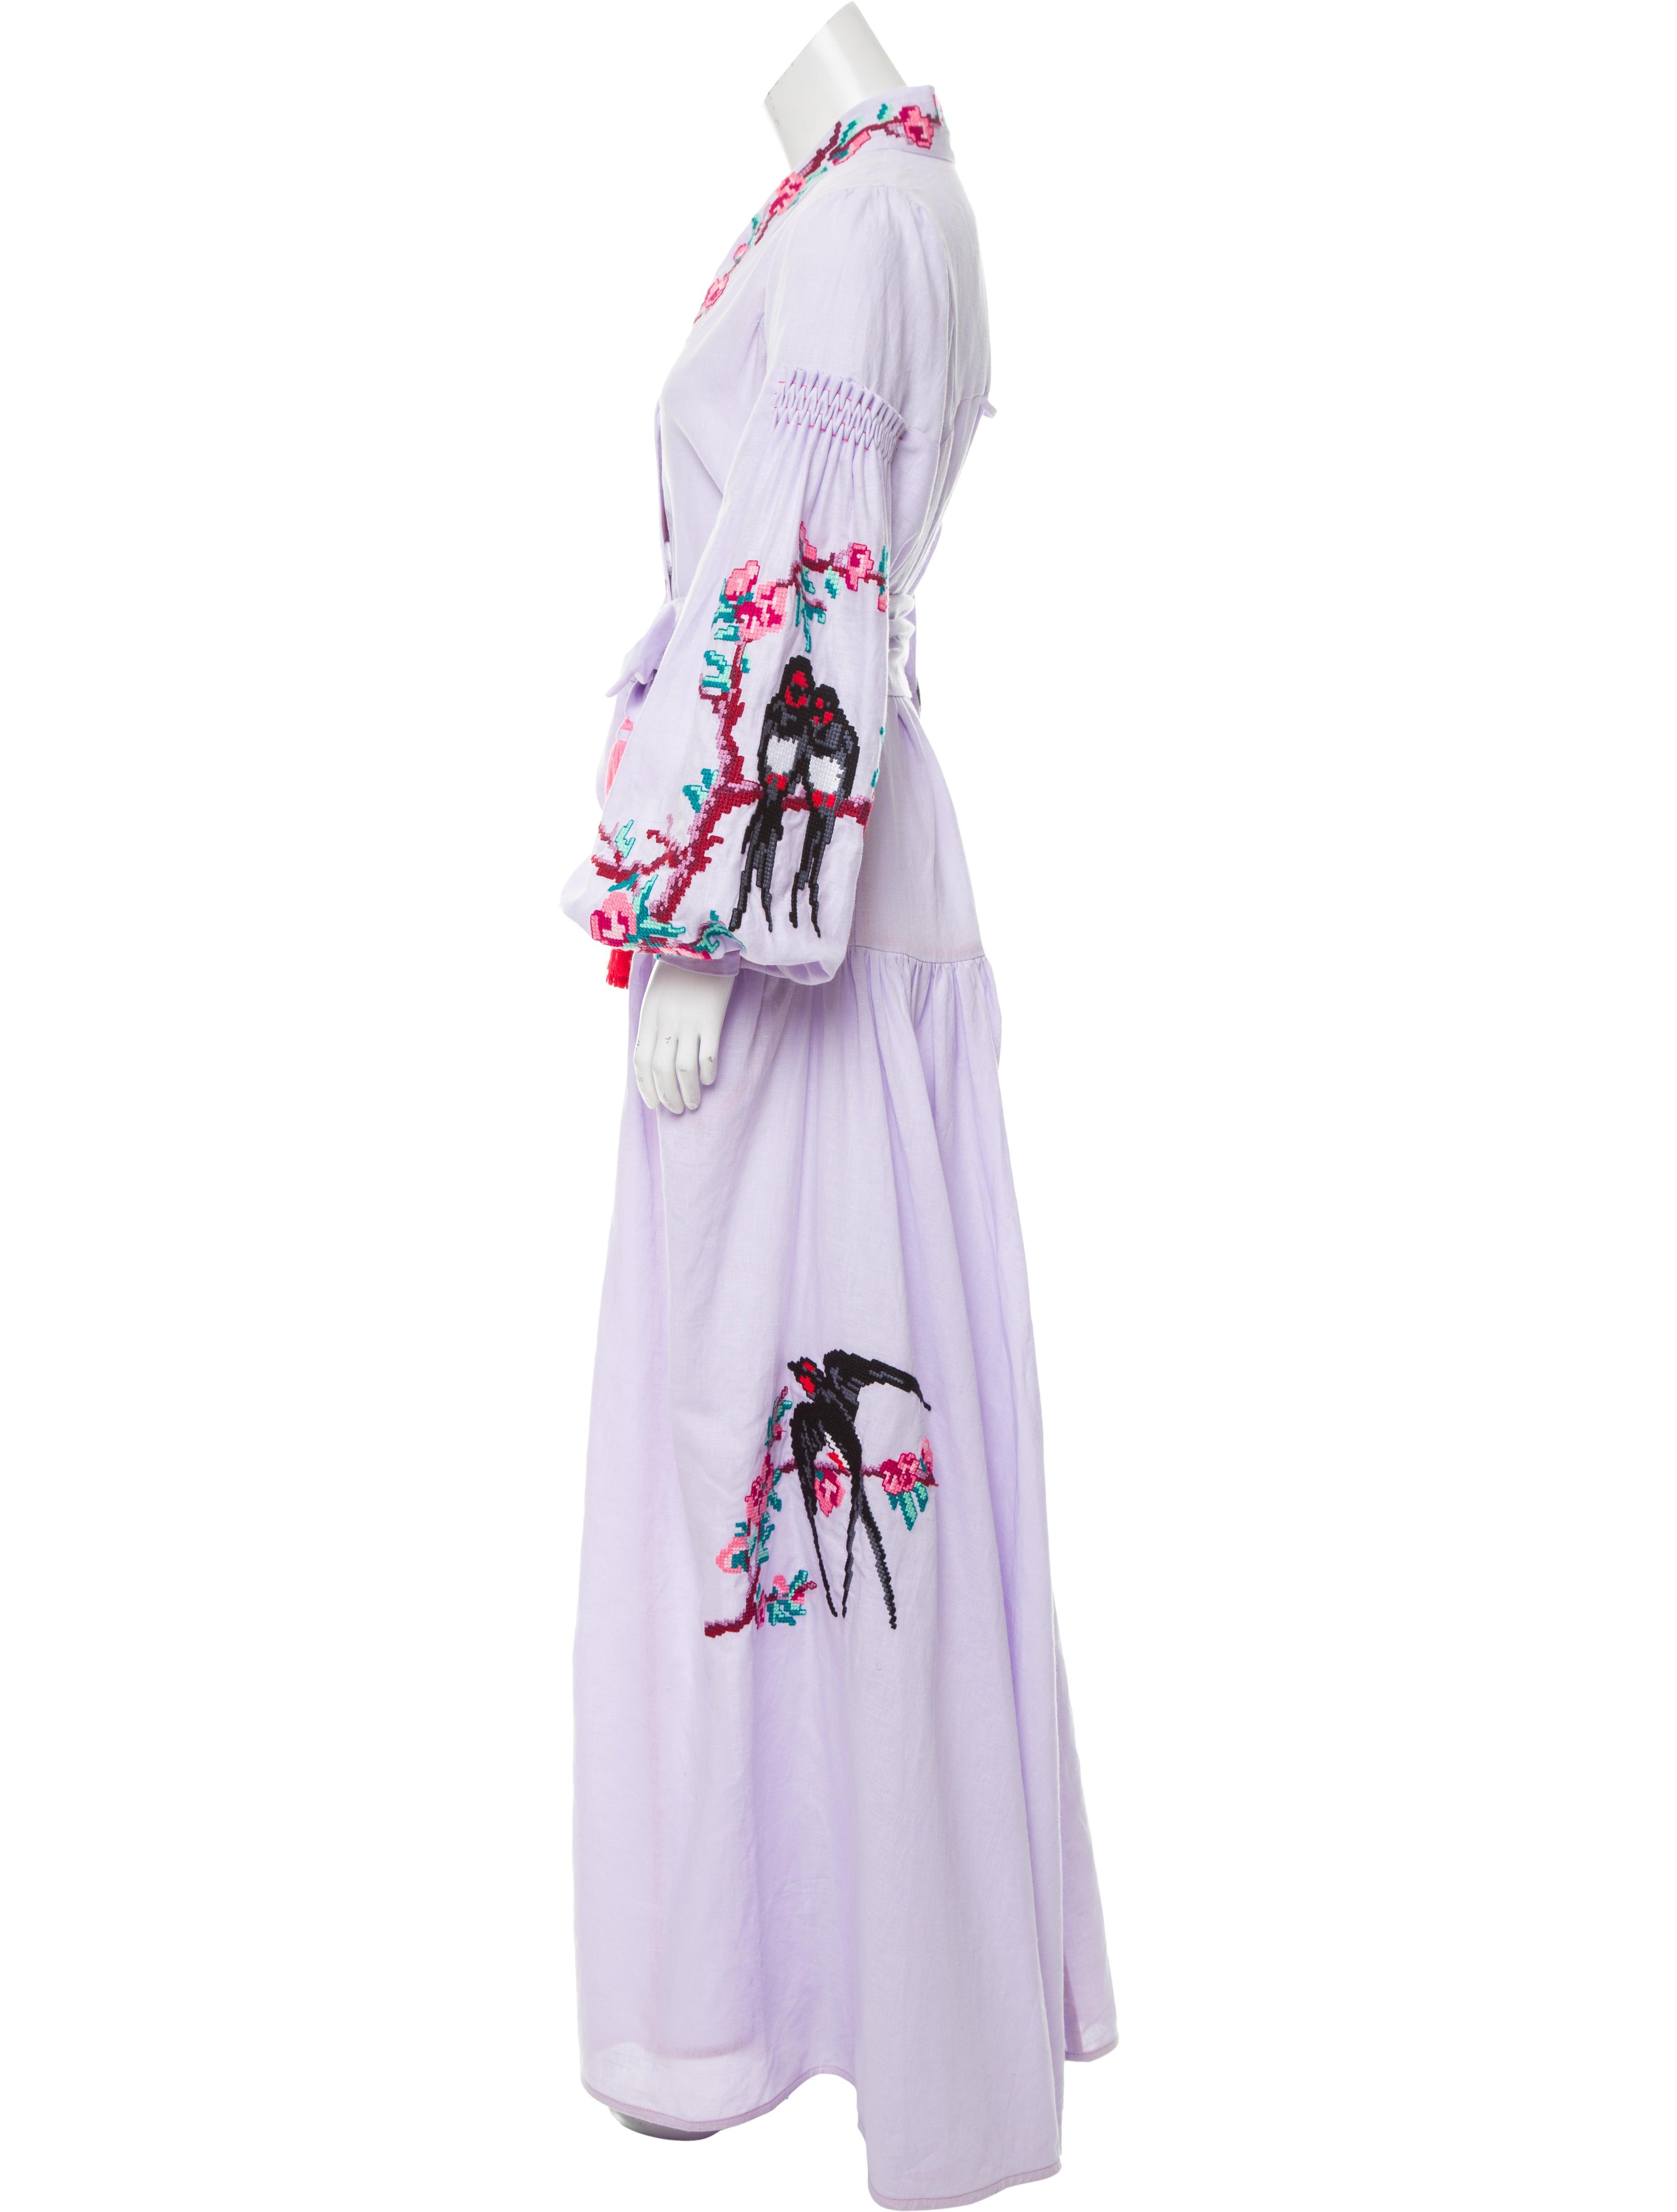 Yuliya magdych embroidered sakura love dress w tags